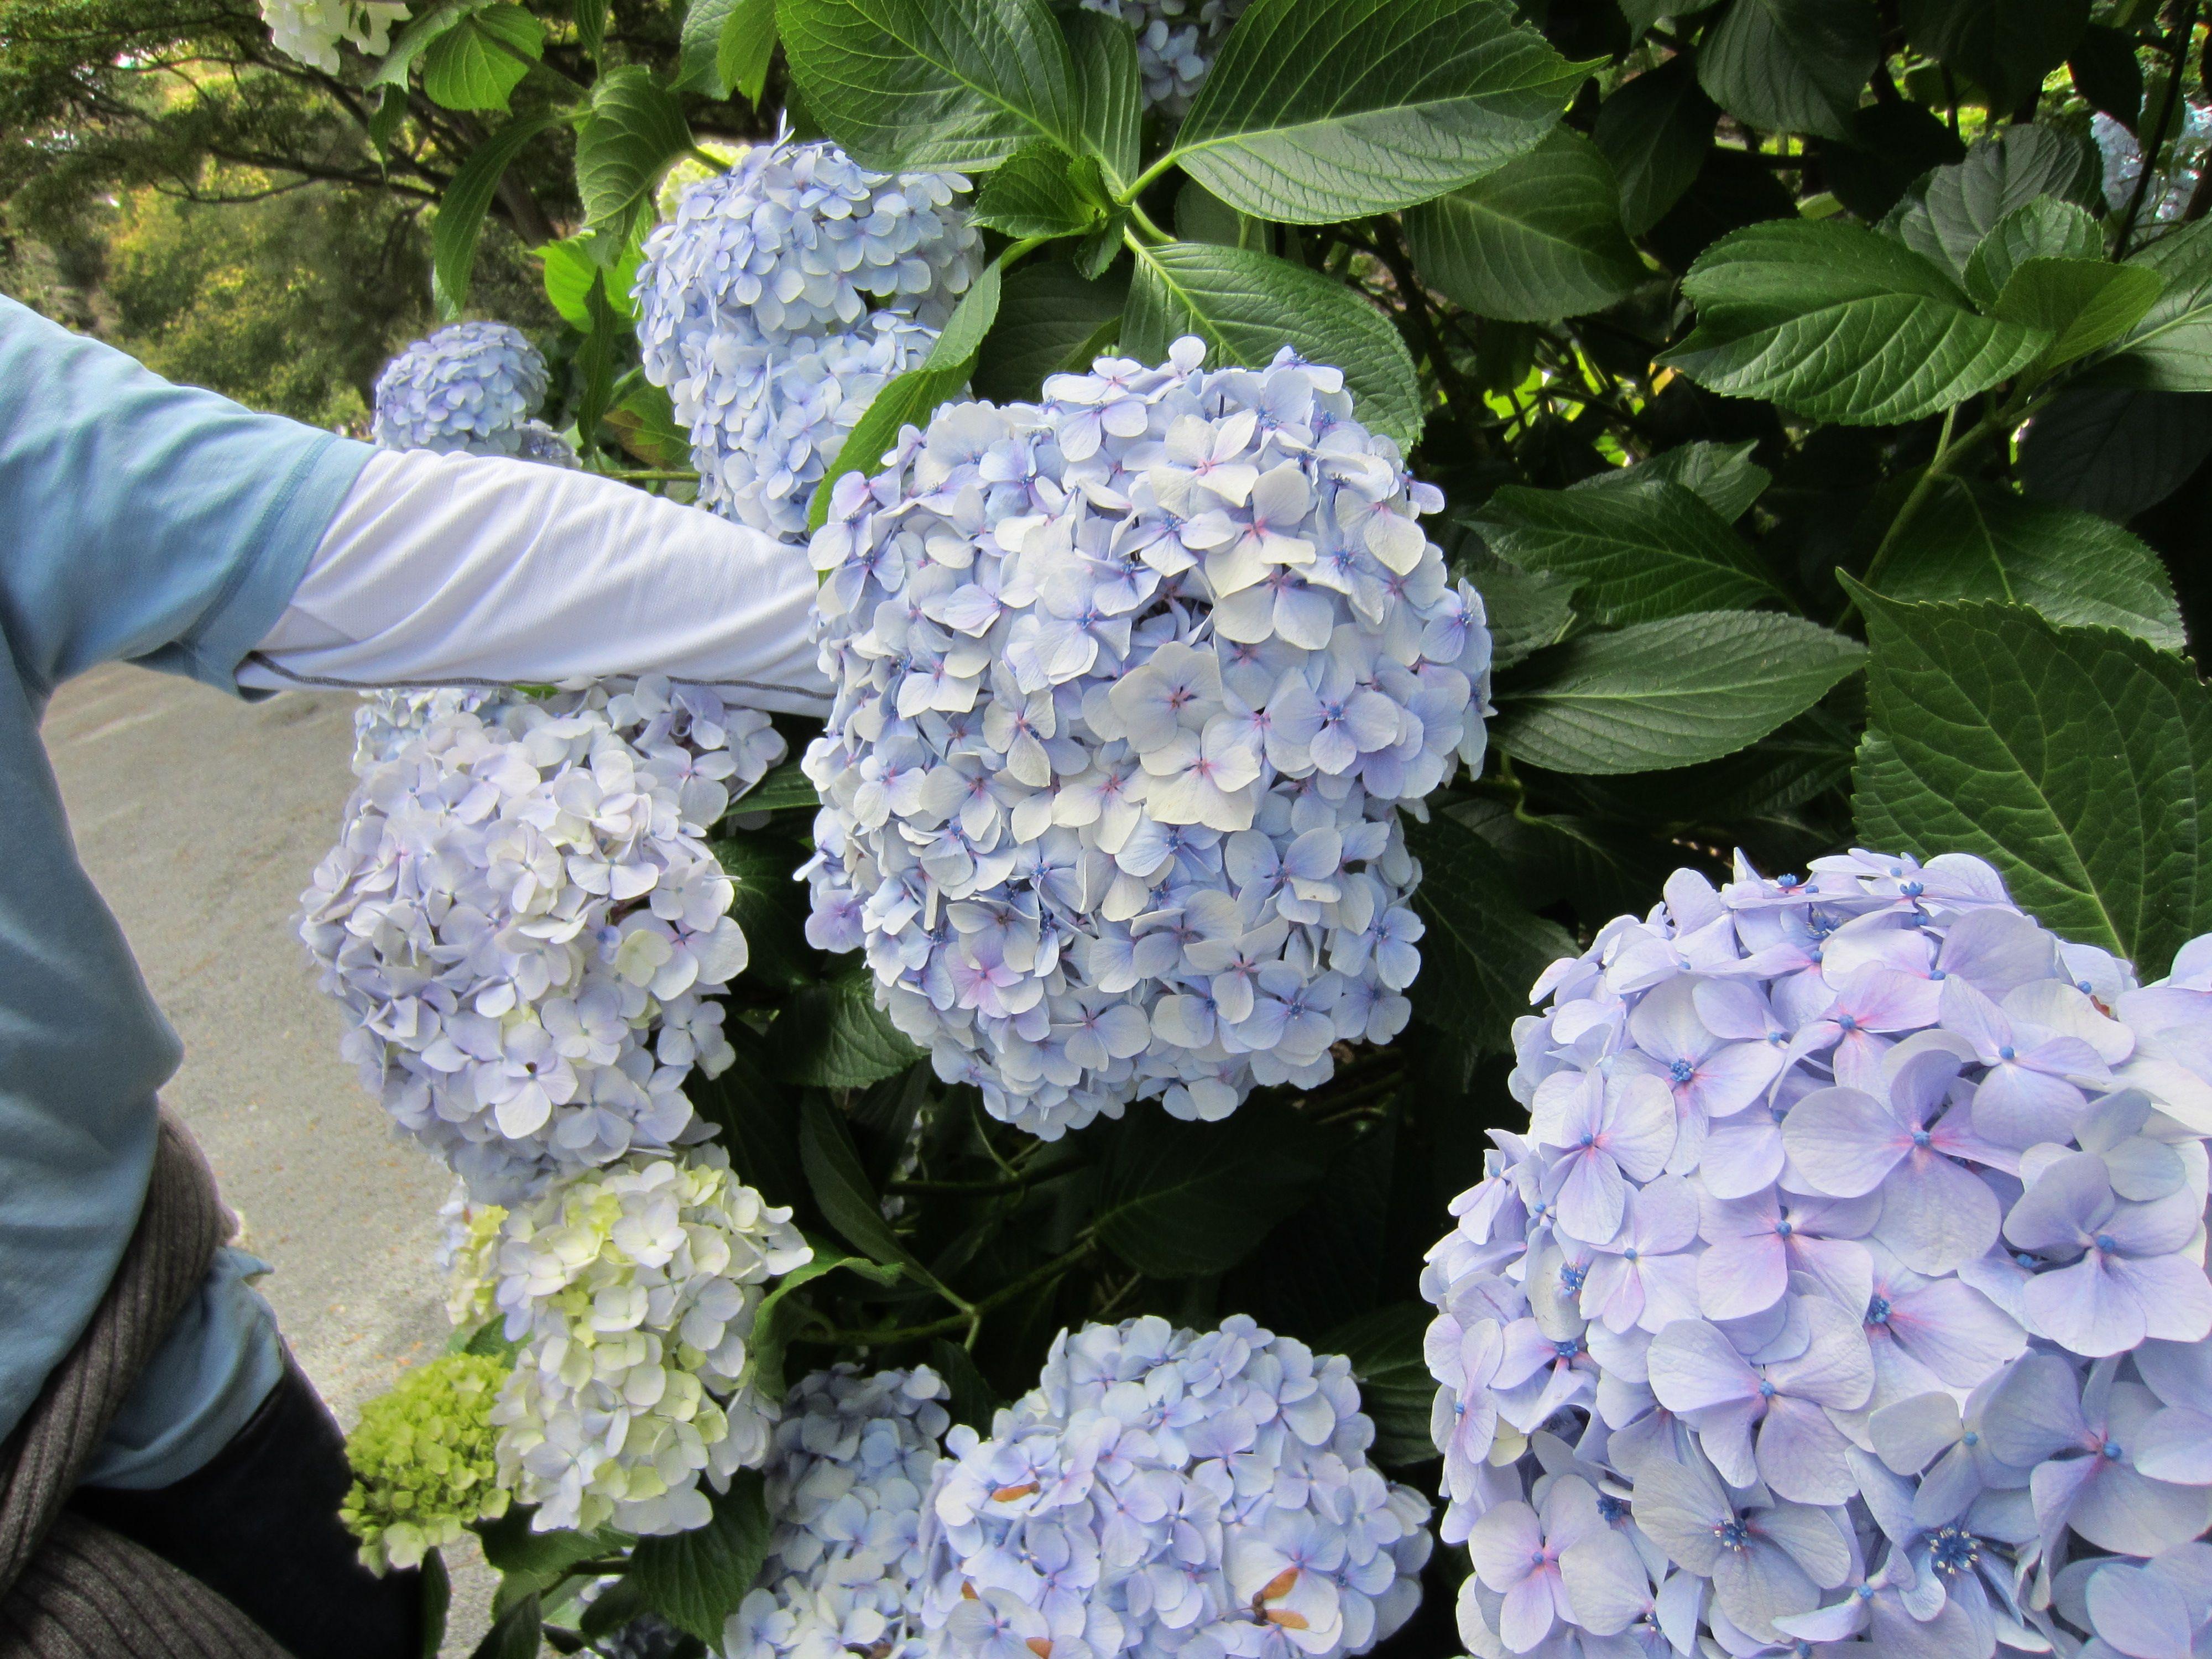 Baby Blue Hydrangea In The Botanic Gardens Of Christchurch New Zealand Blue Hydrangea Botanical Gardens Botanical